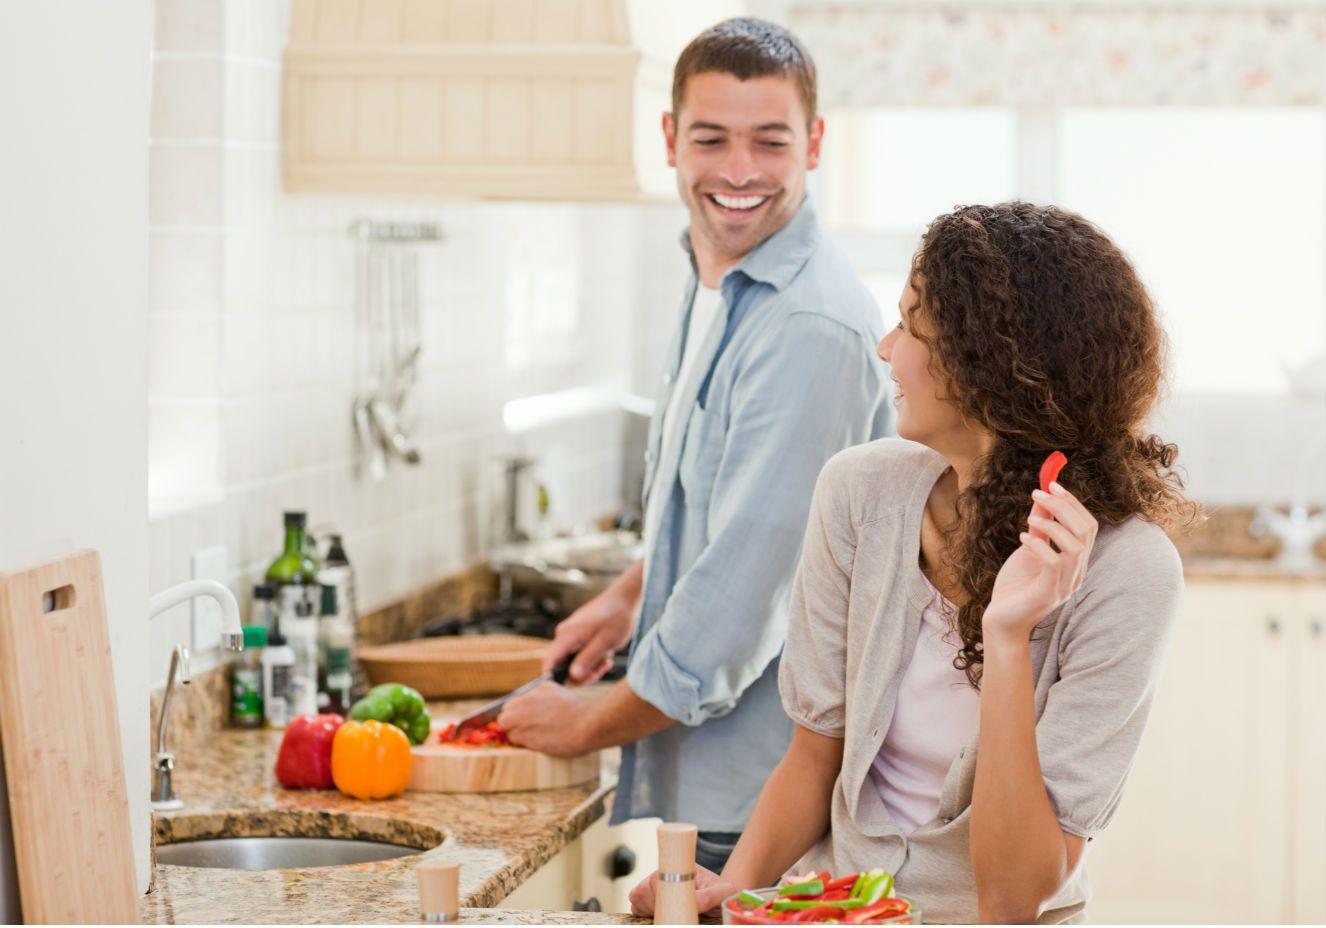 Nutricionista ensina casal a emagrecer junto